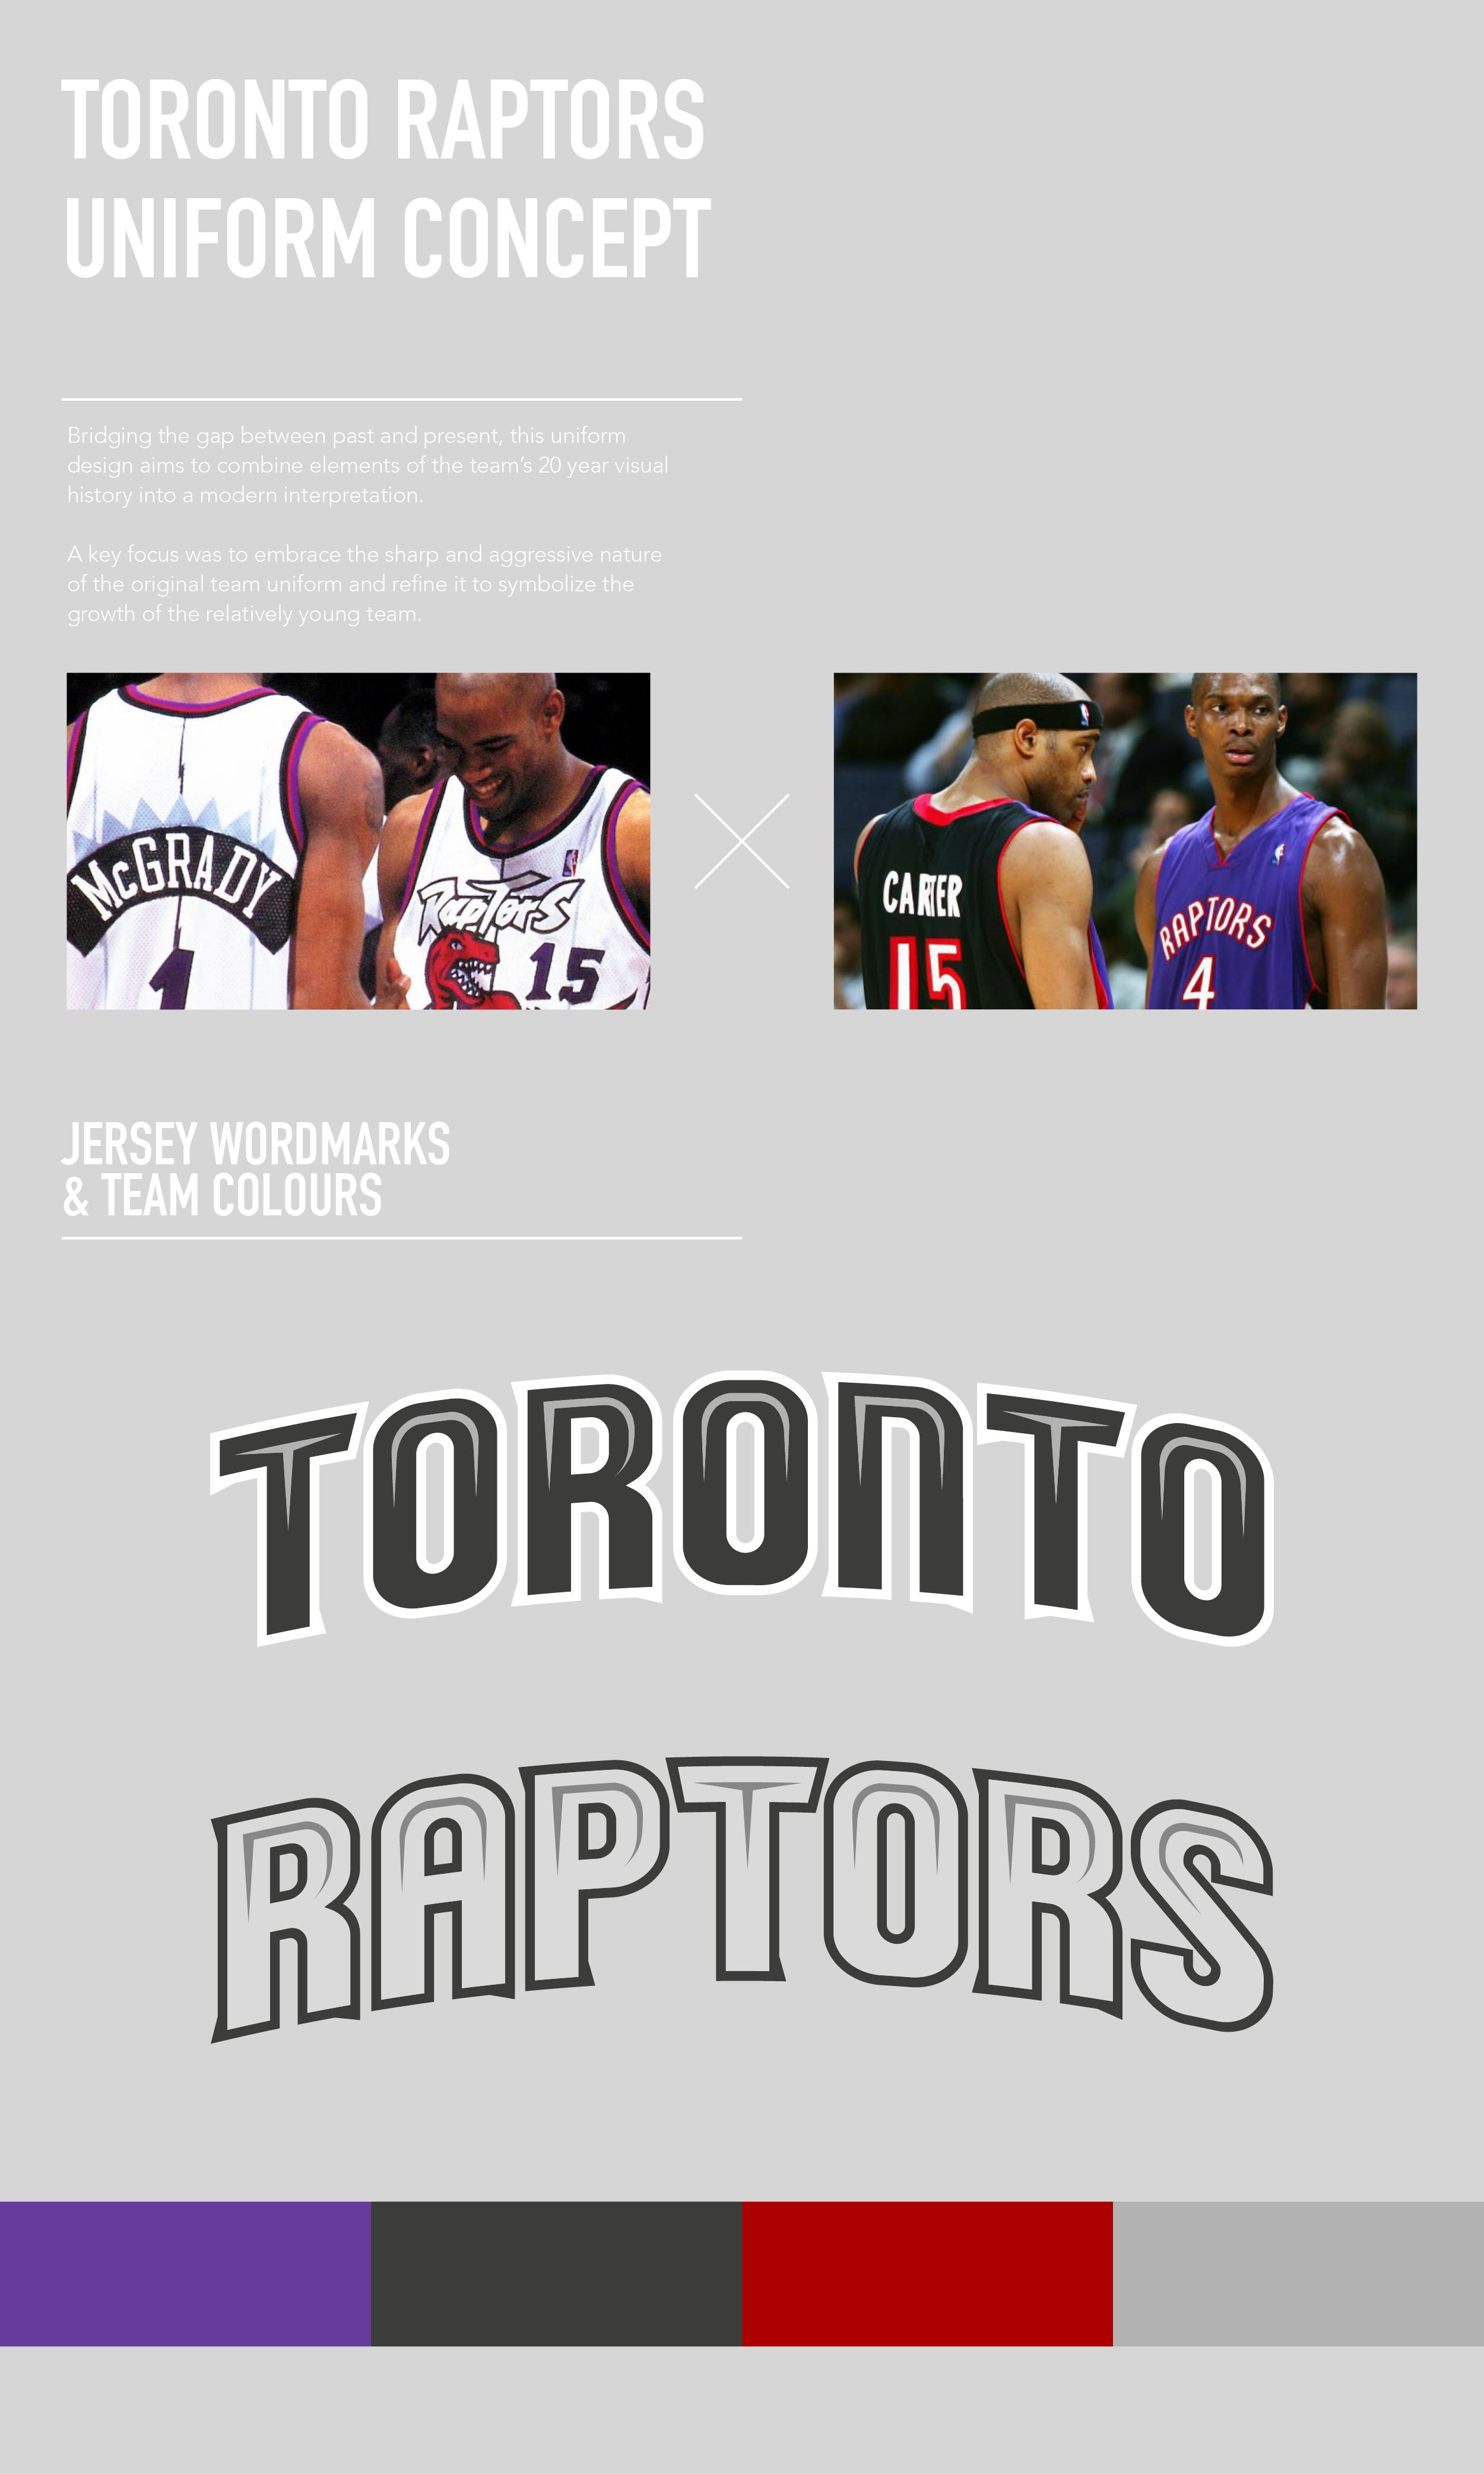 Basketball UniformsRaptors Toronto Raptors Uniform Concept on Behance ... 778041f65